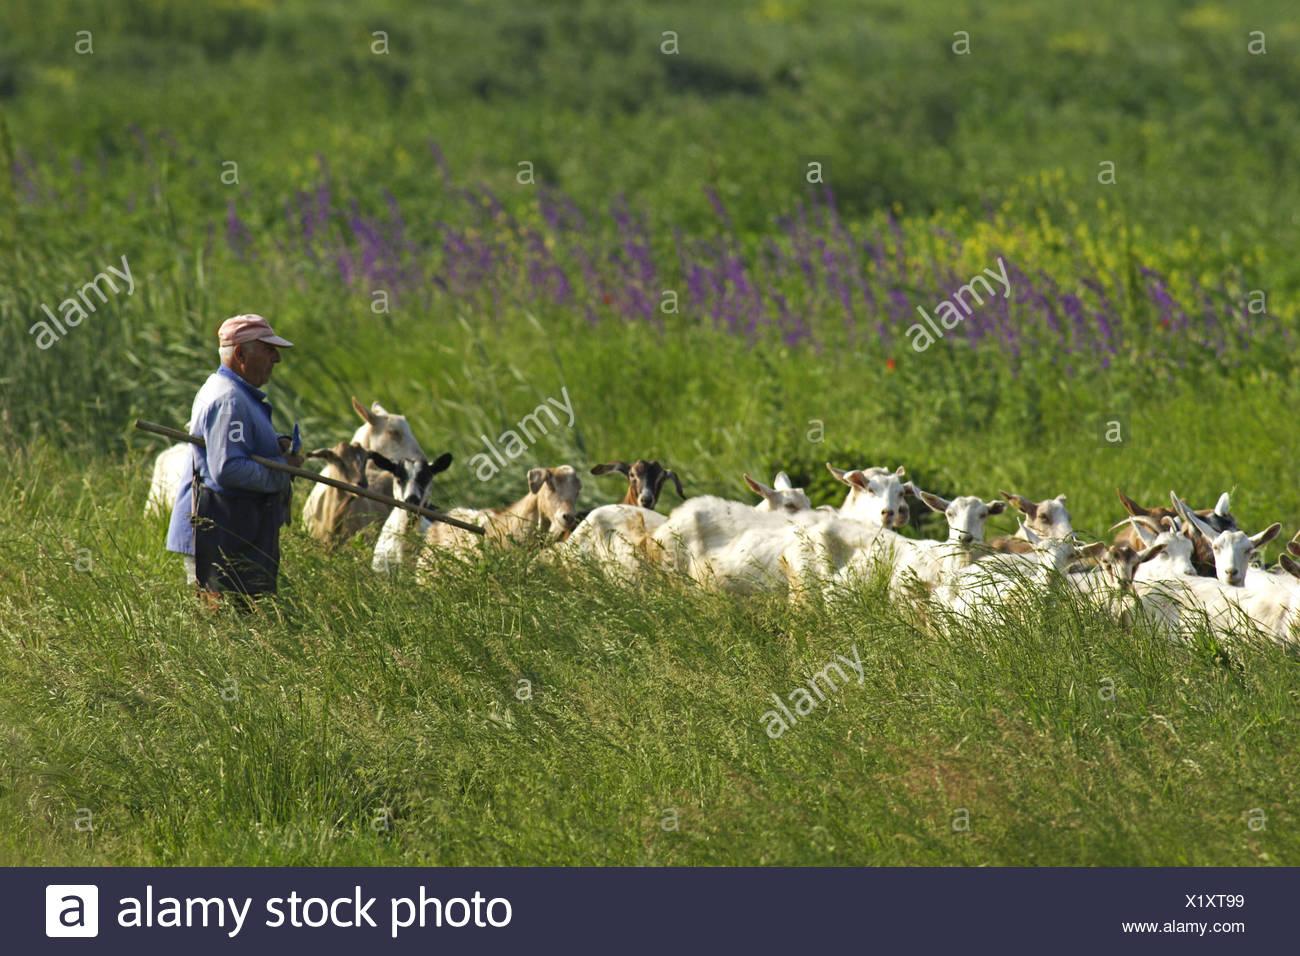 Domestic Goat Capra Hircus Herdsman With Herd In Meadow Bulgaria